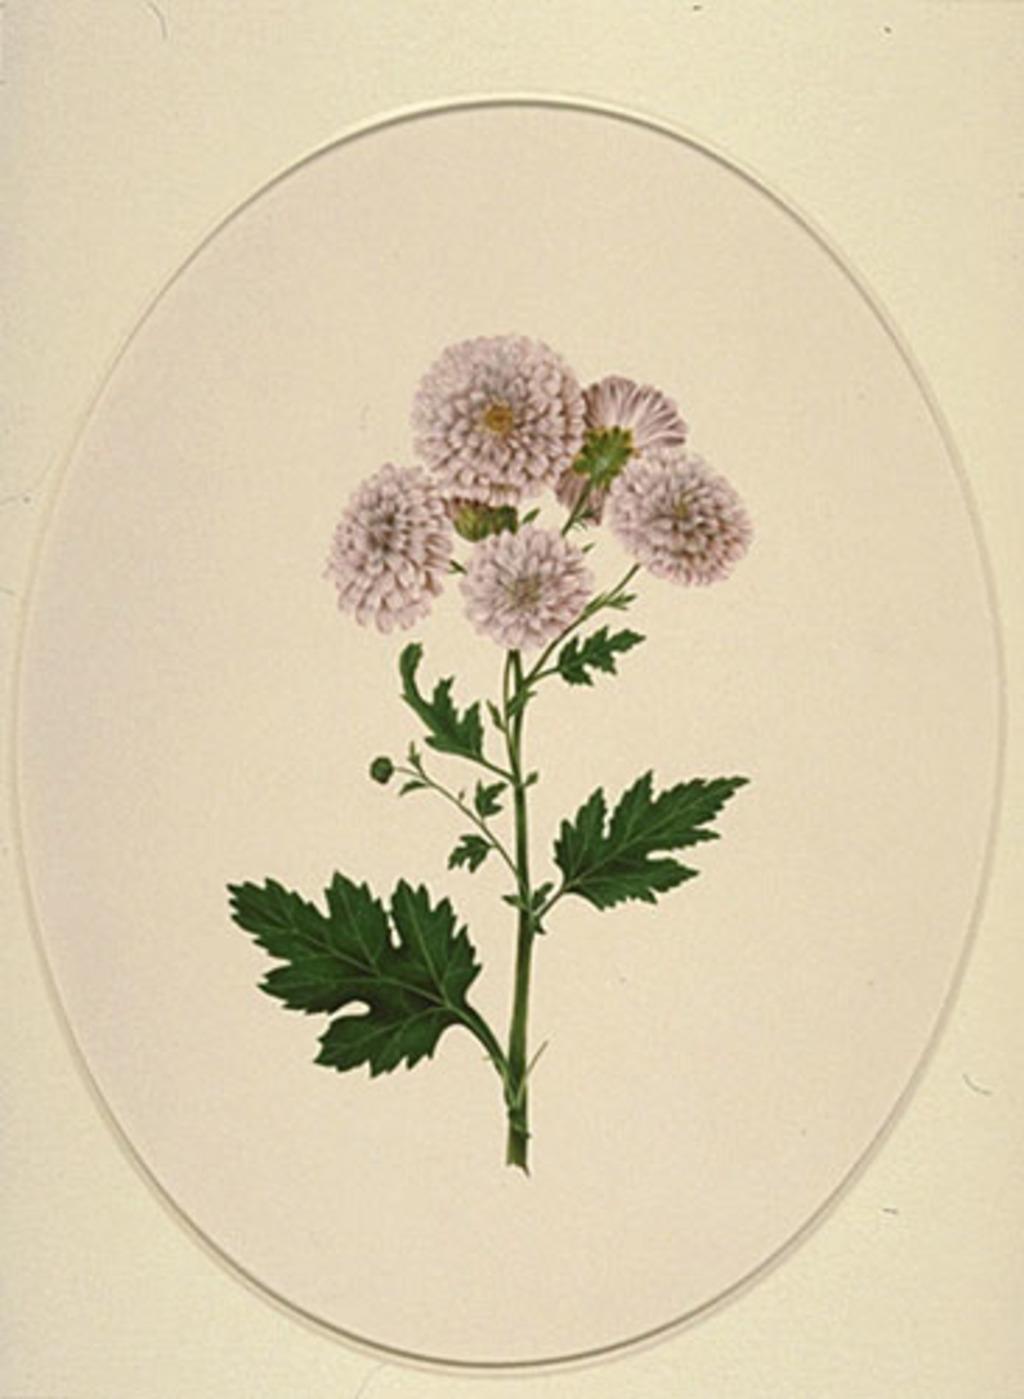 Chrysanthèmes des fleuristes - «Chrysanthemum X morifolium»